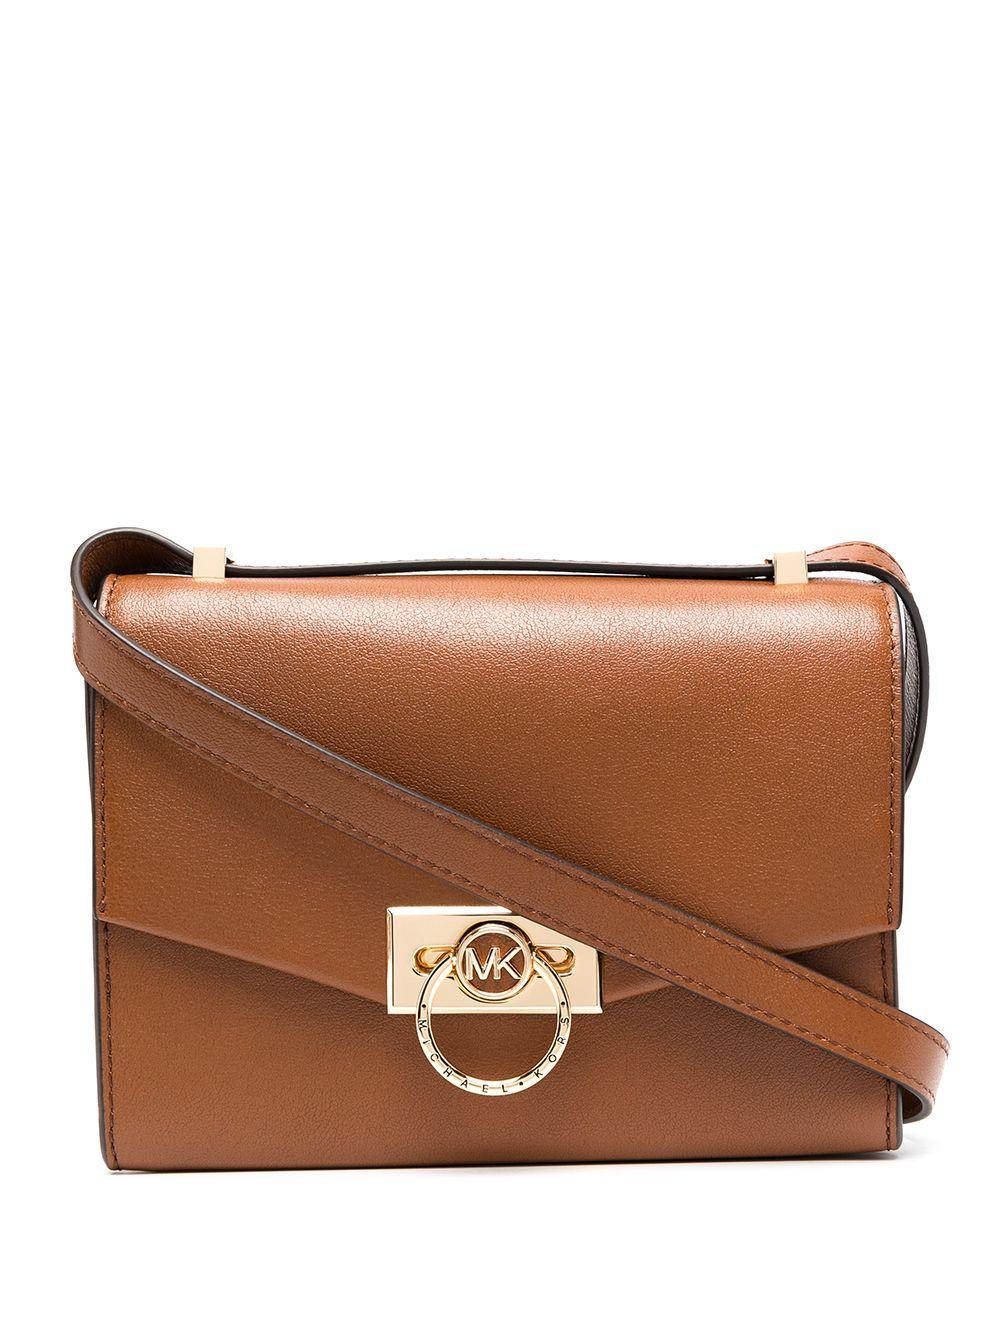 Hendrix Leather Crossbody Bag